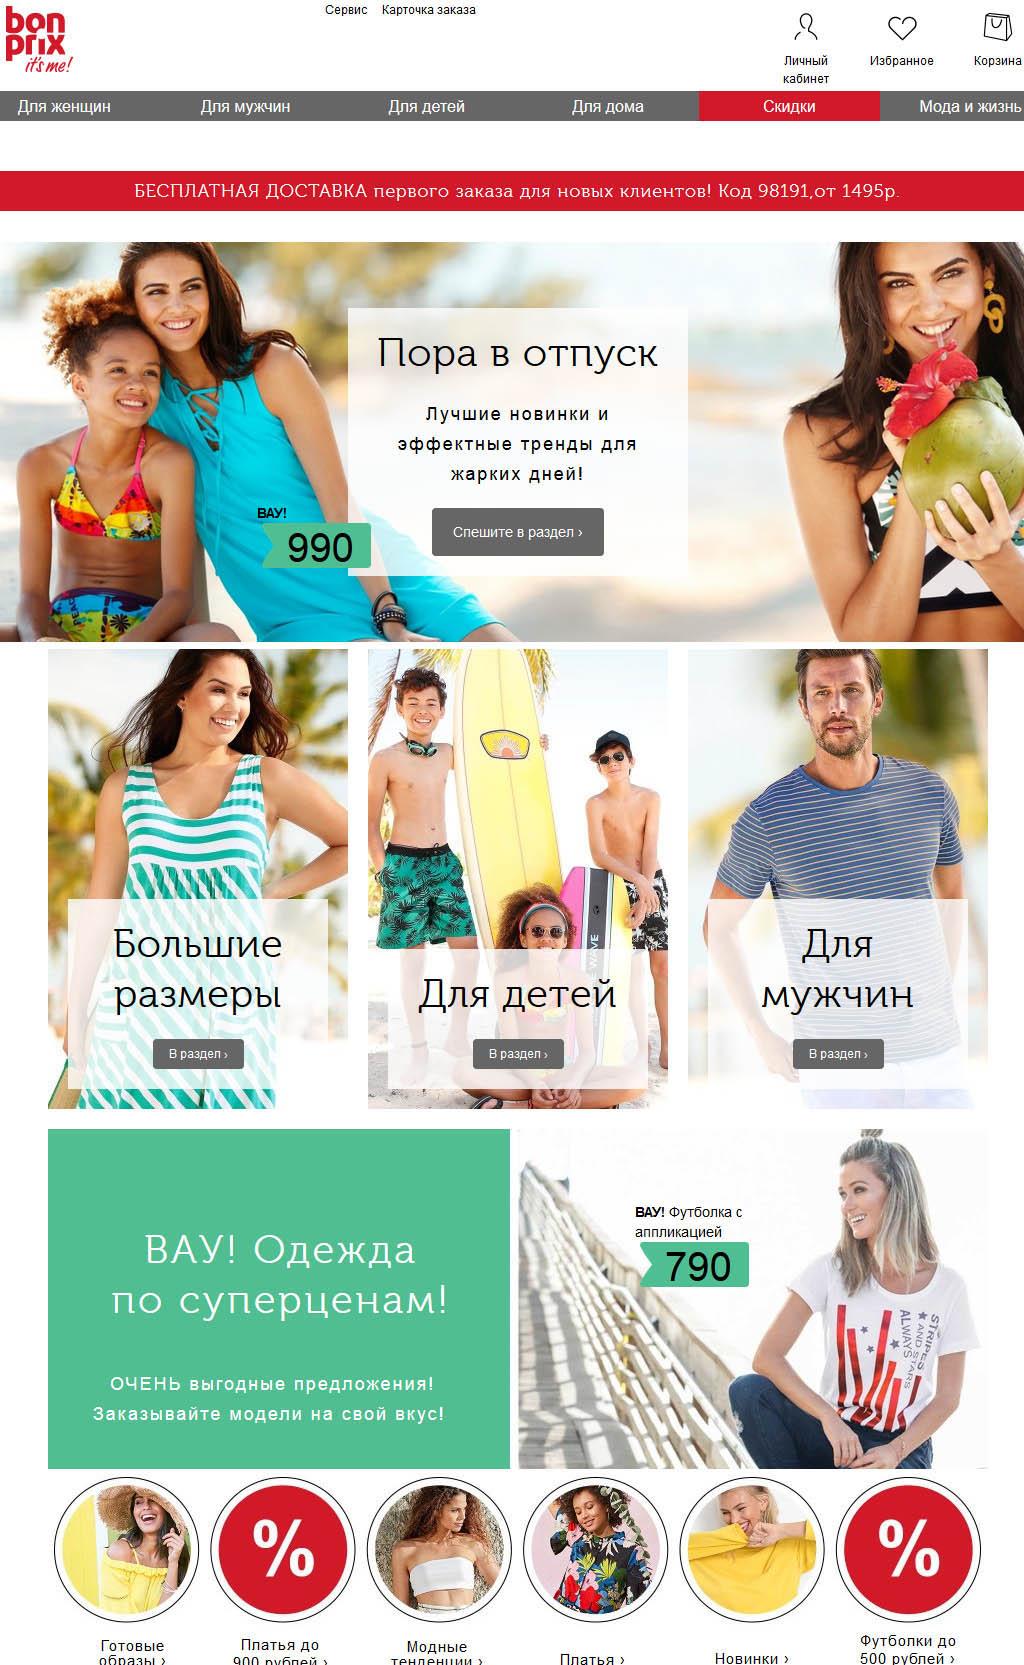 Интернет-магазин Бонприкс